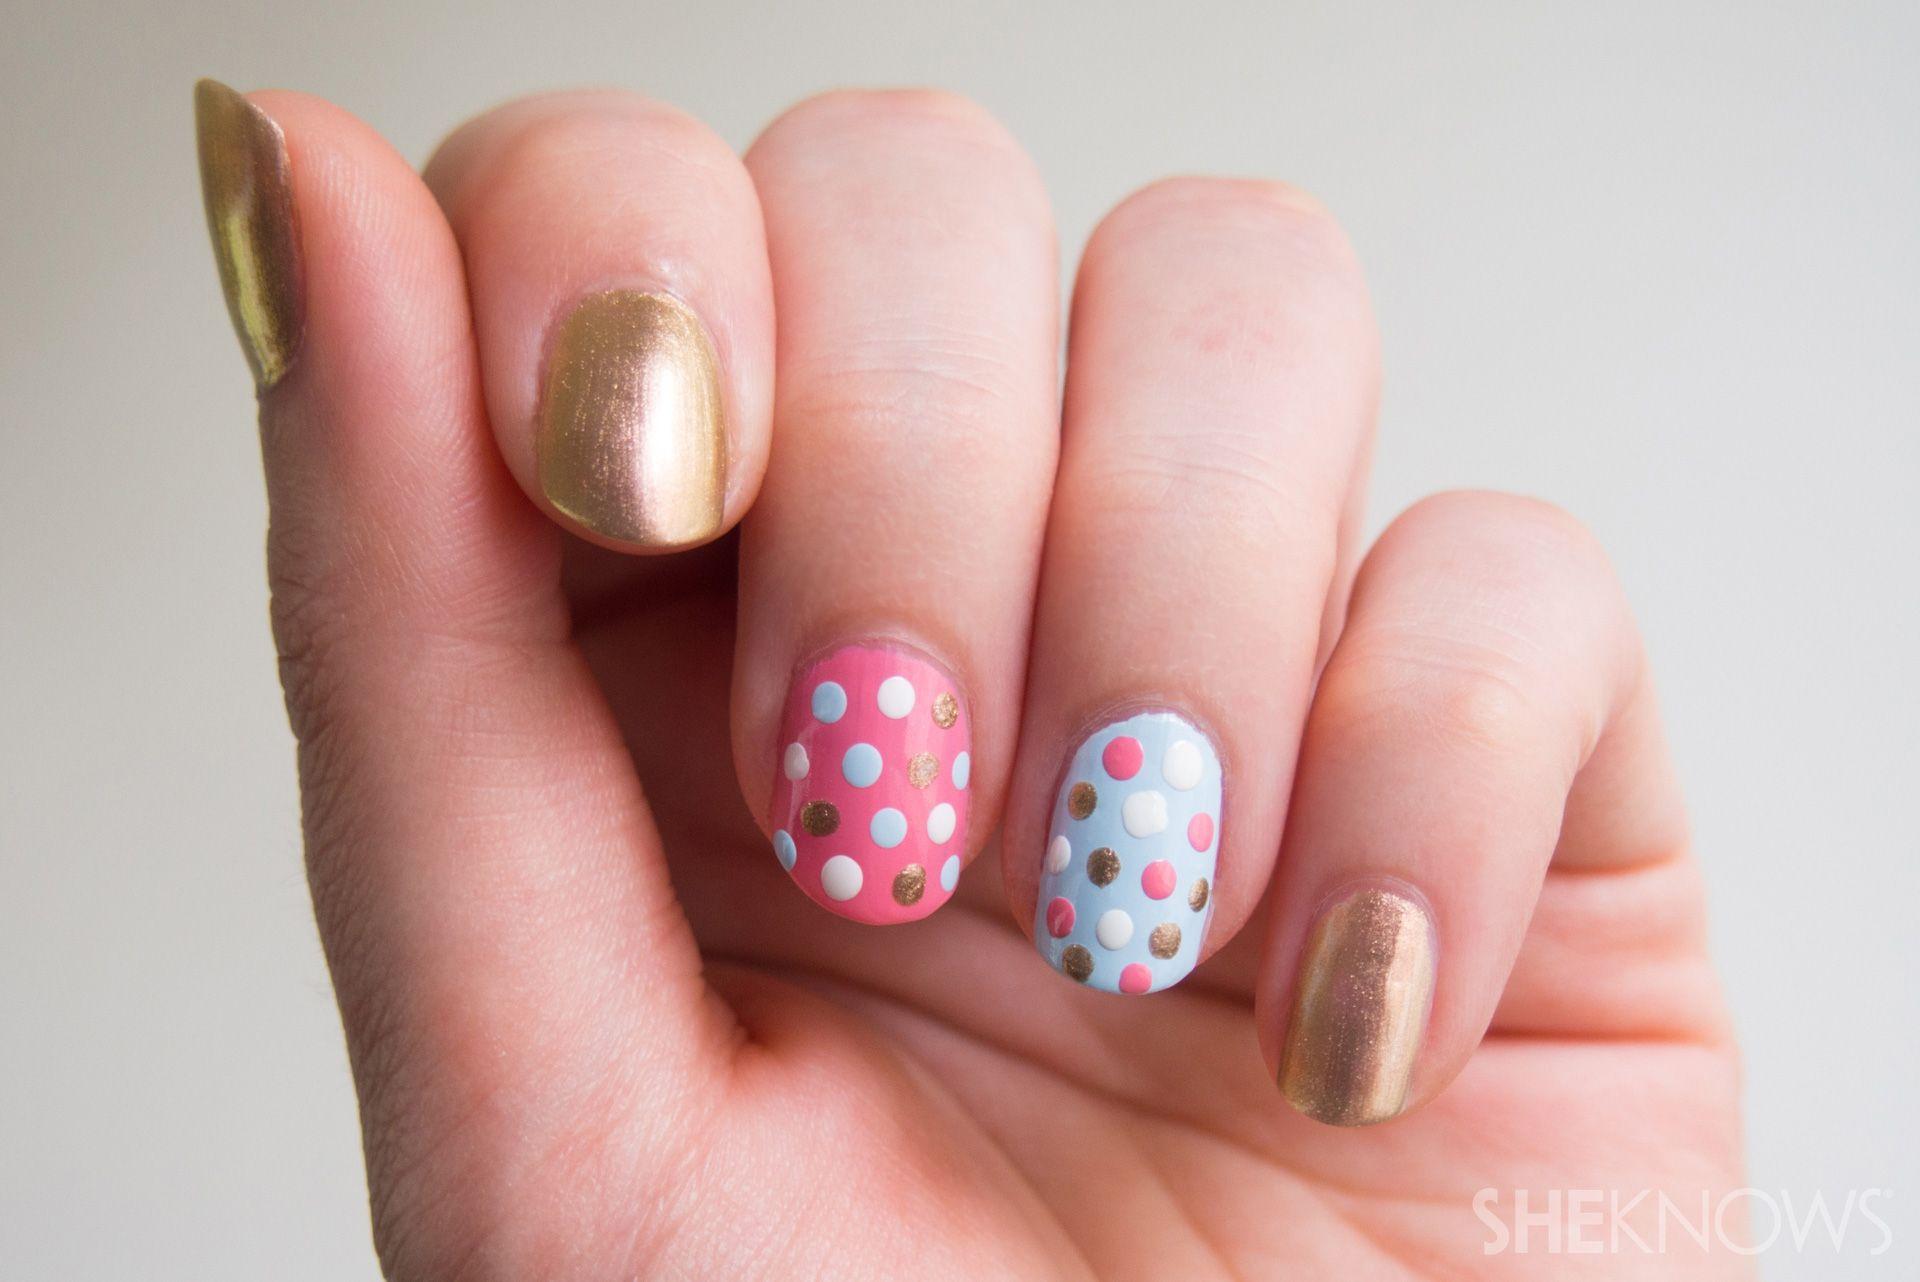 Q Tip Nail Art Google Search Nails Pinterest Art Google